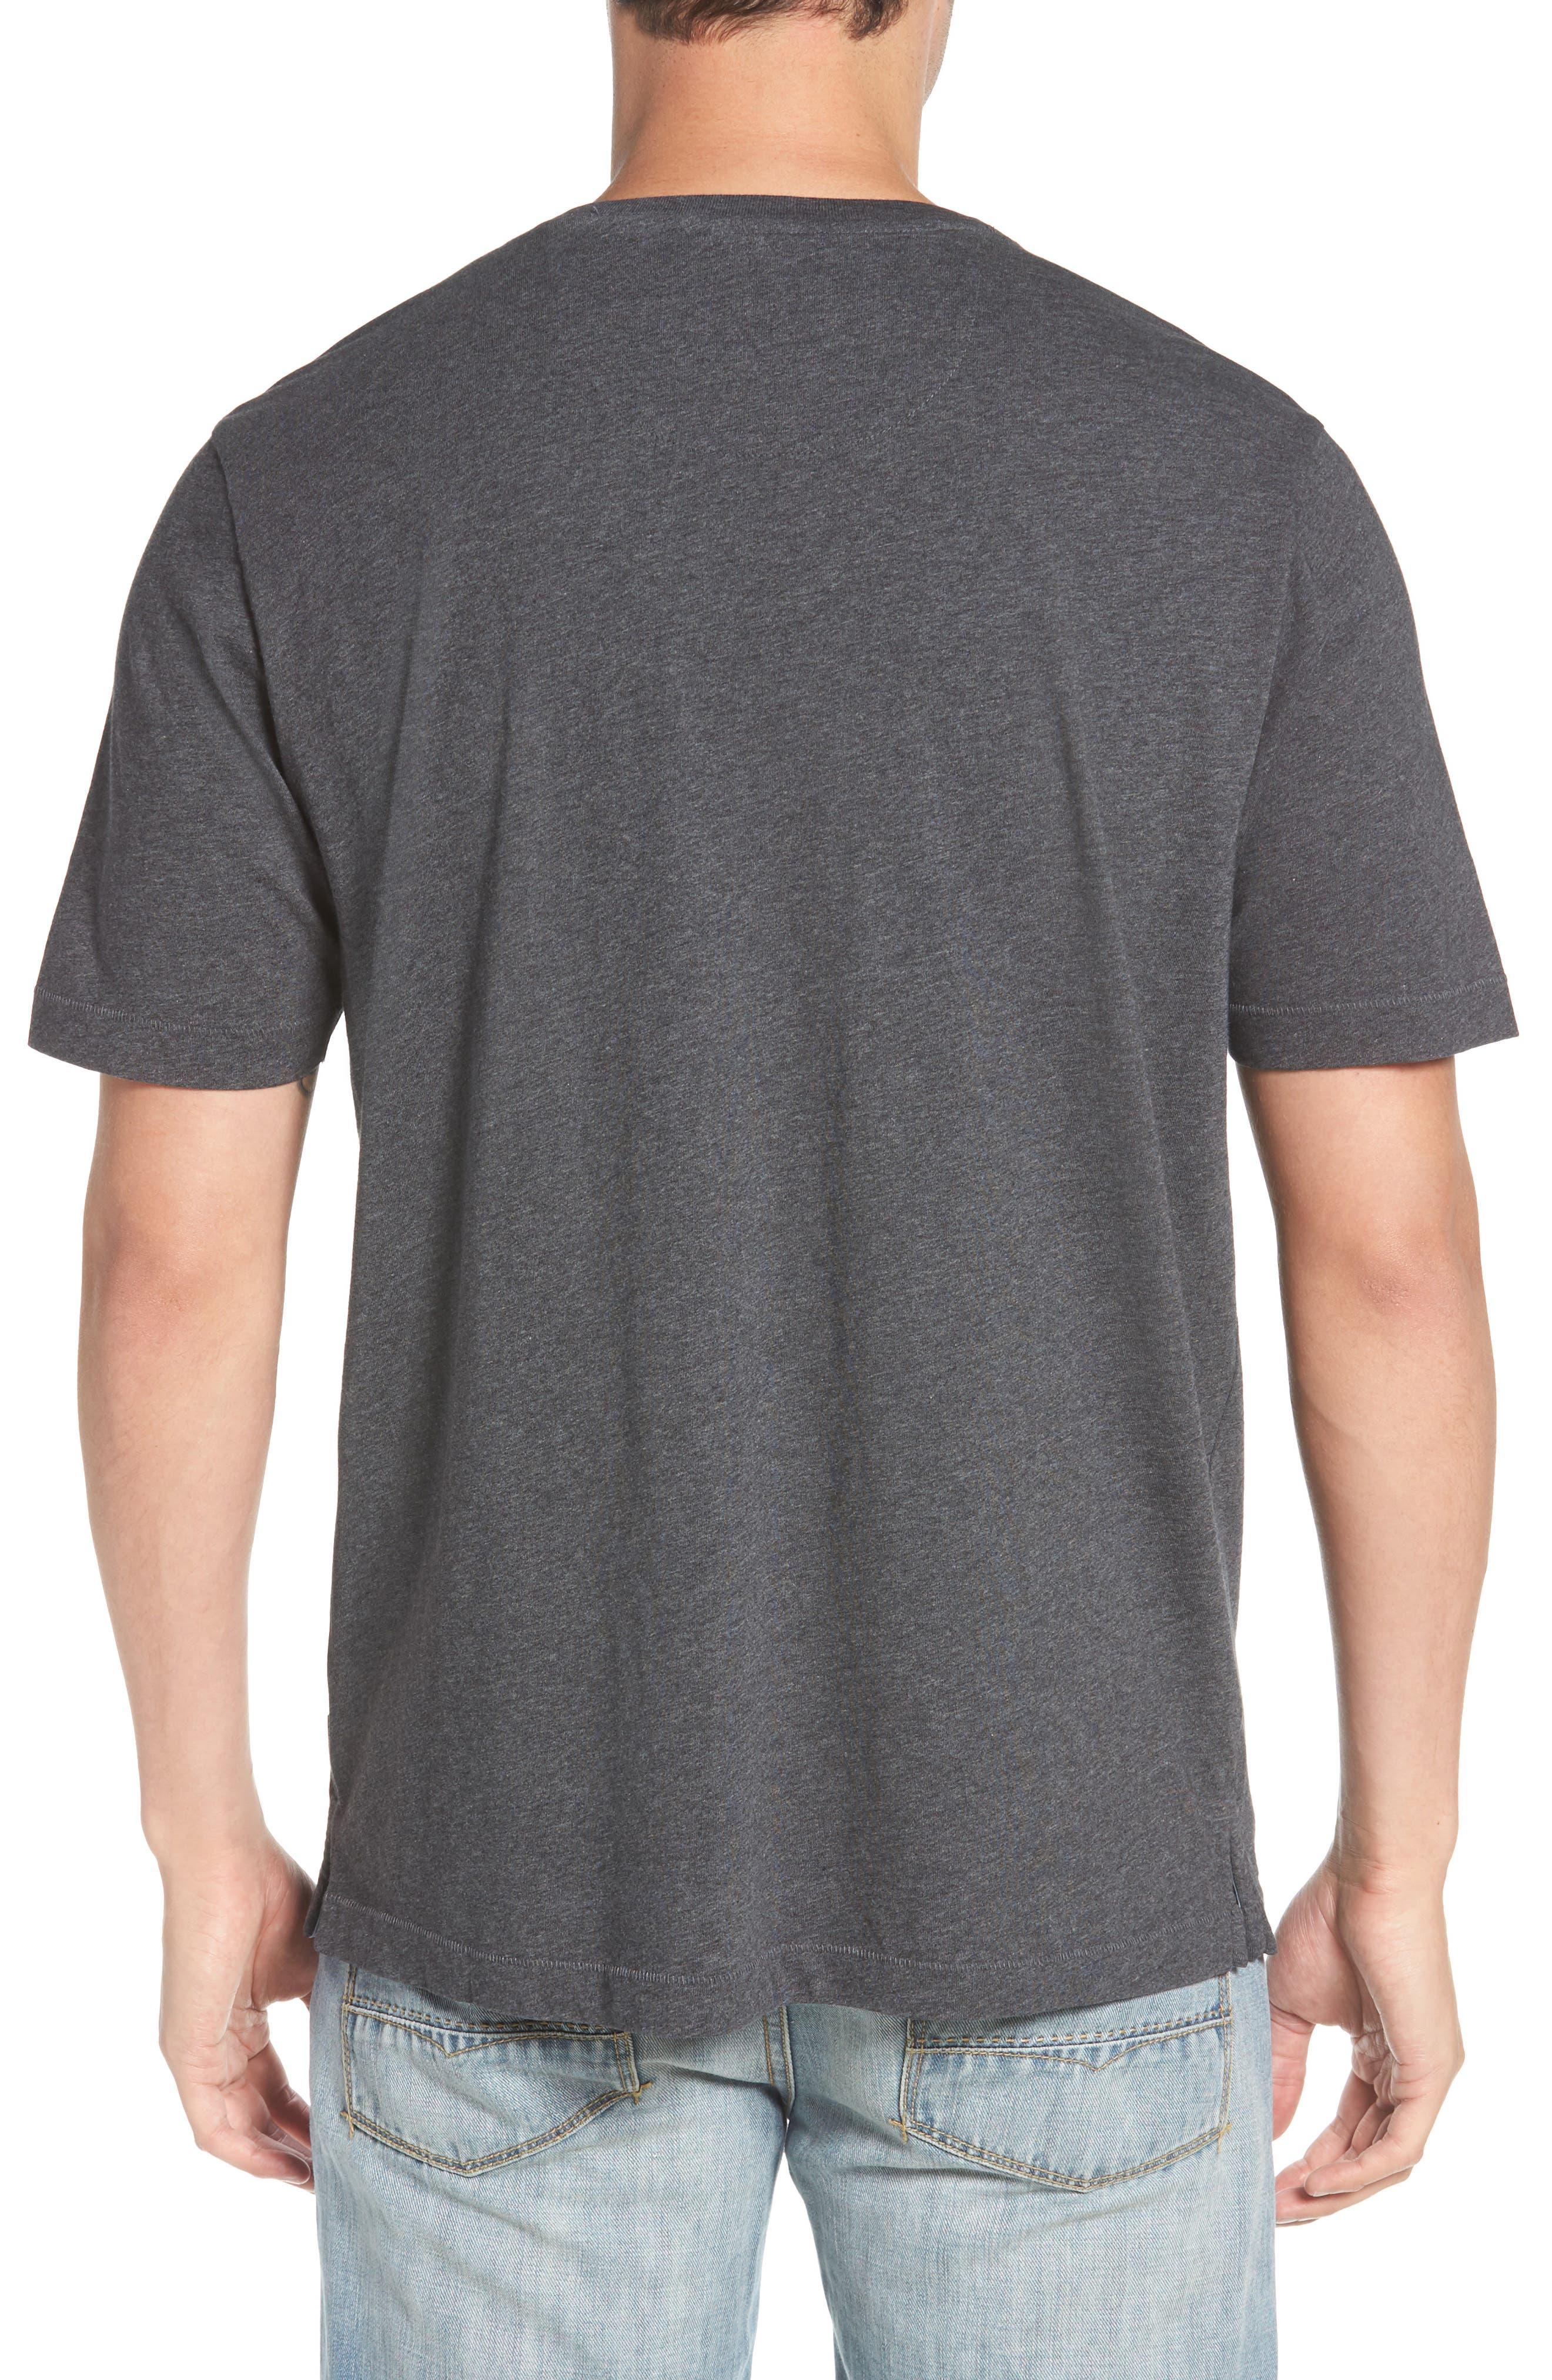 'New Bali Sky' Original Fit Crewneck Pocket T-Shirt,                             Alternate thumbnail 3, color,                             001